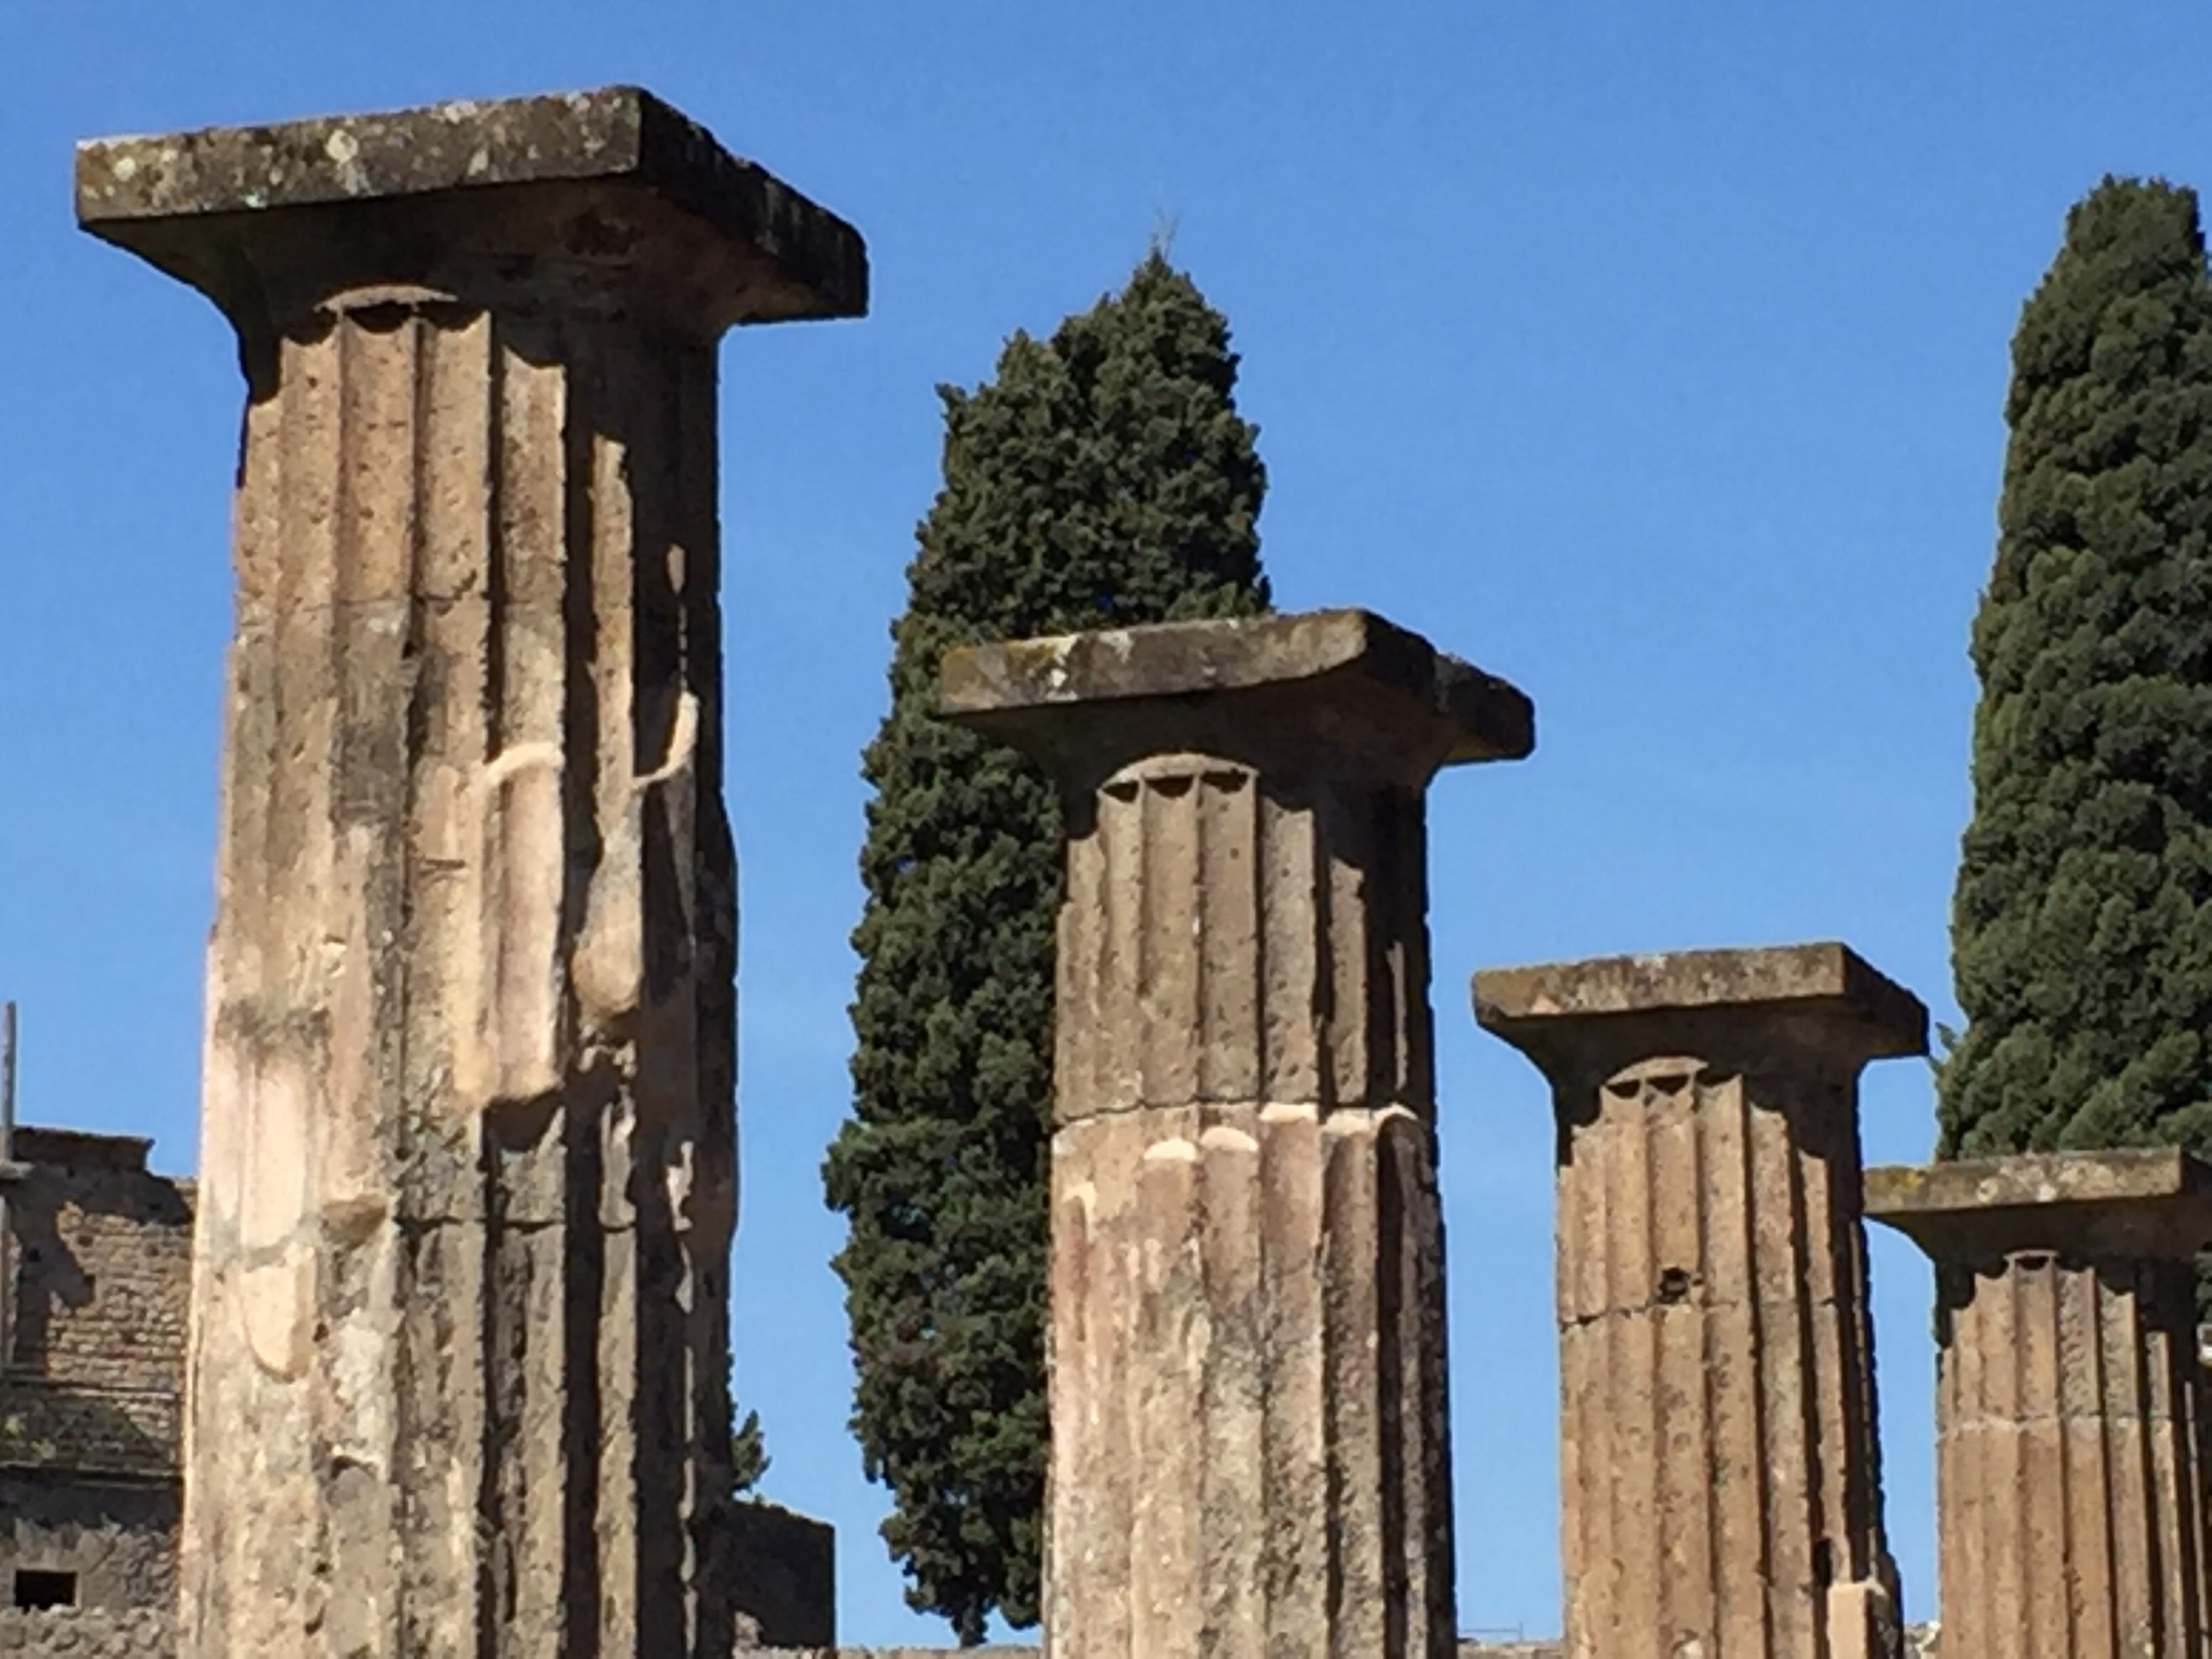 Pompeii, near the entrance.